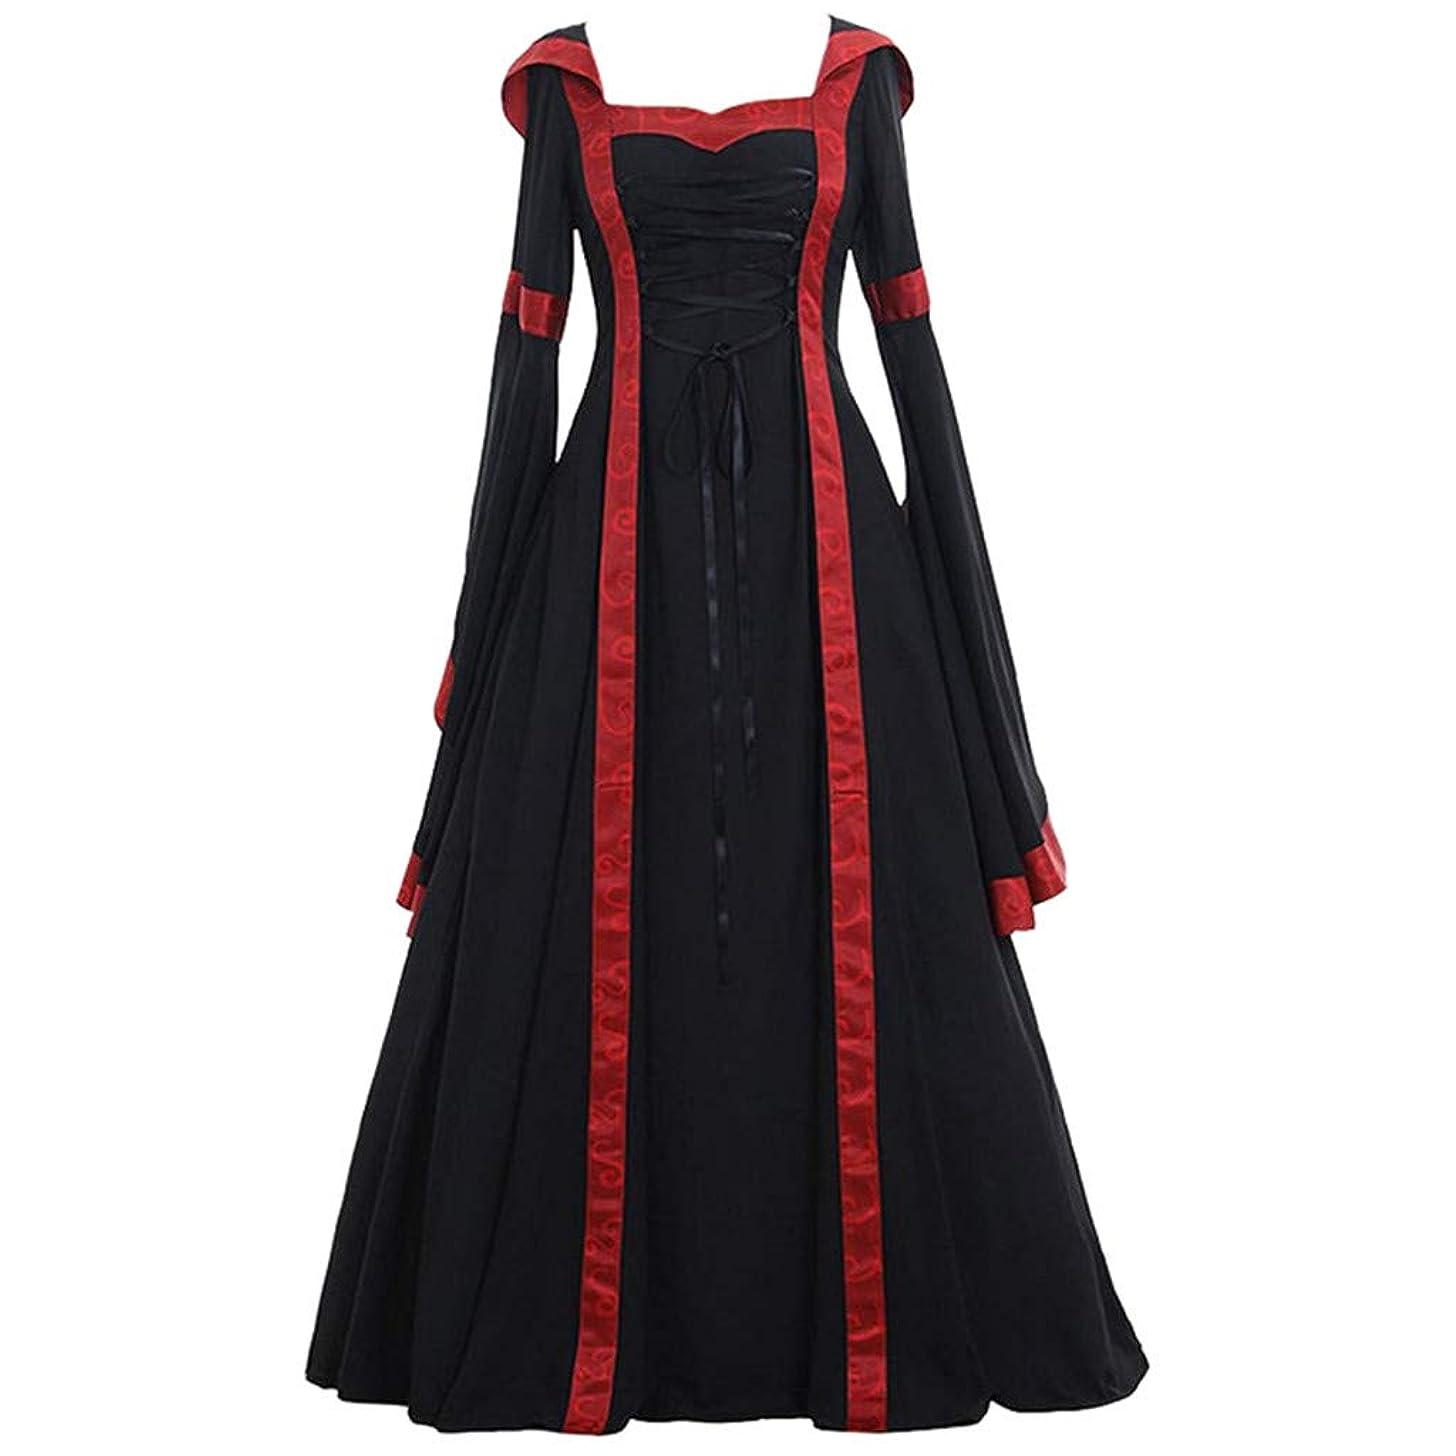 Caopixx Dress for Women Elegant 1950s Vintage Long Sleeve Medieval Dress Floor Length Cosplay Costume Princess Dress